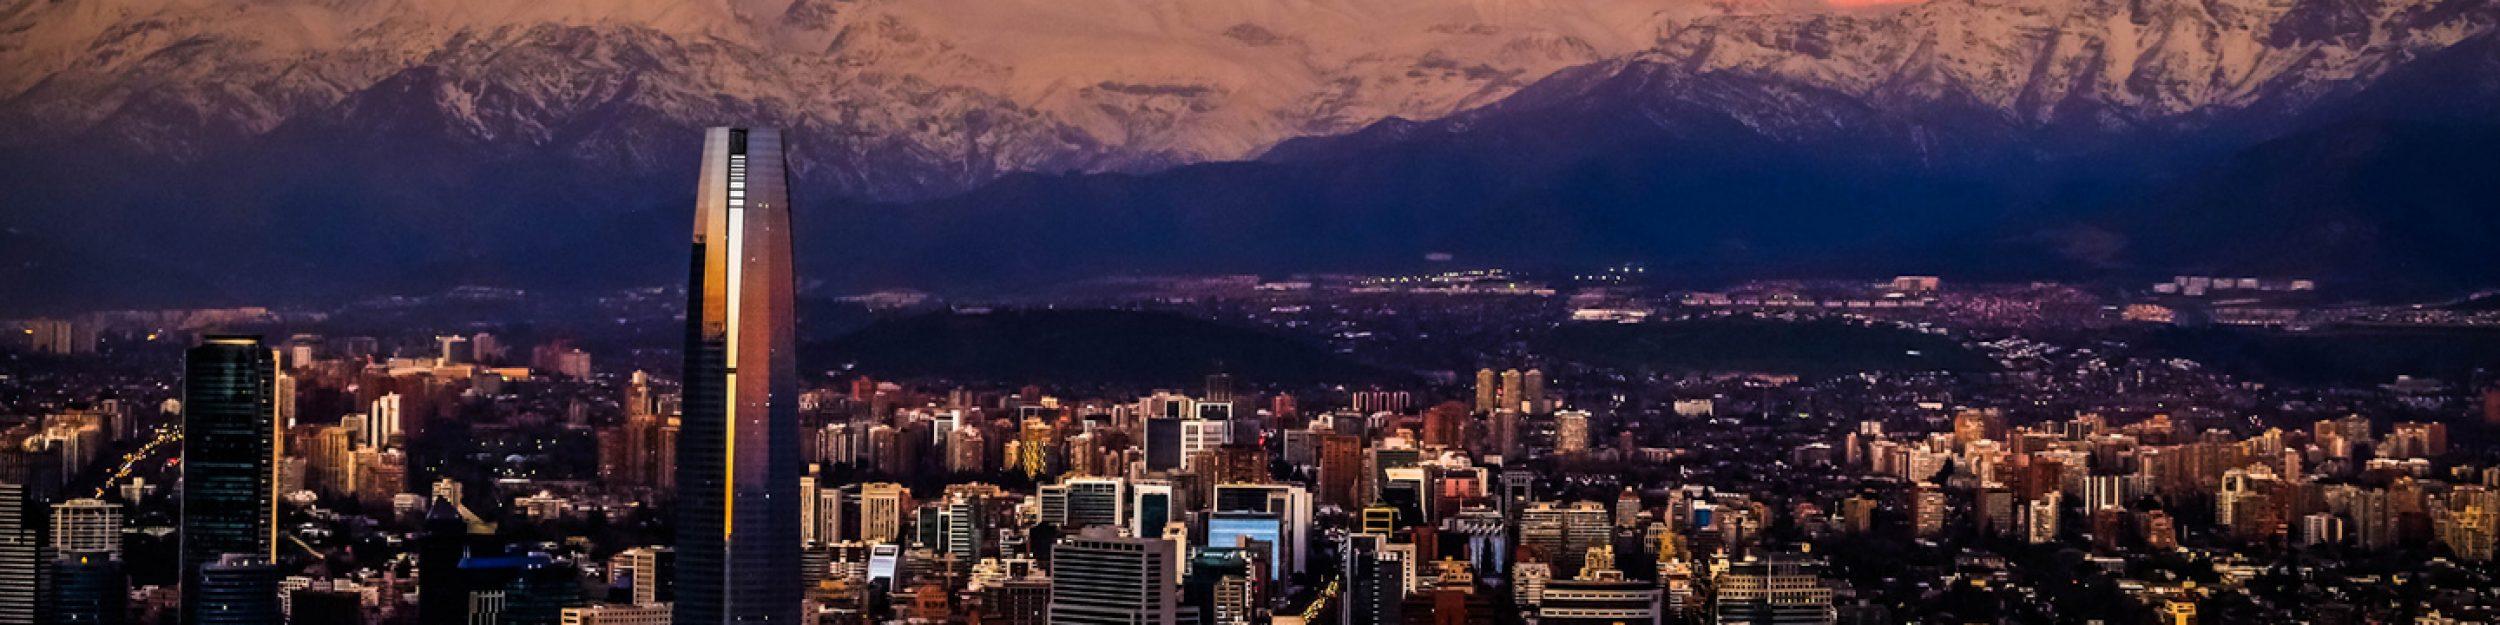 Holding Santa Ana Chile